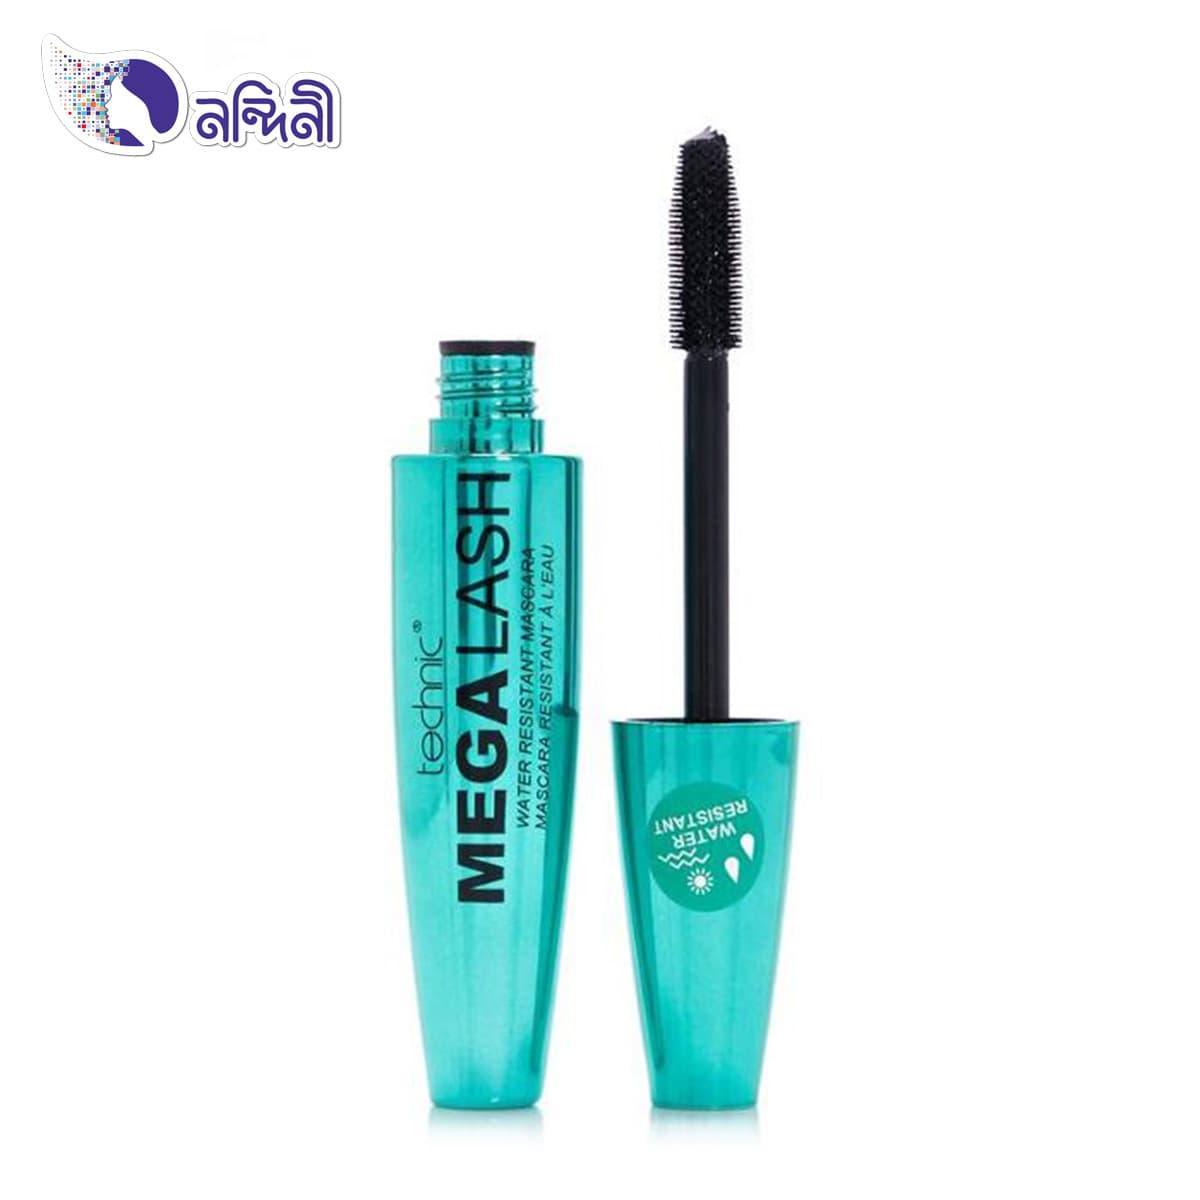 9f191eb8831 Mascara Price In Bangladesh - Buy Mascara Online from Daraz.com.bd